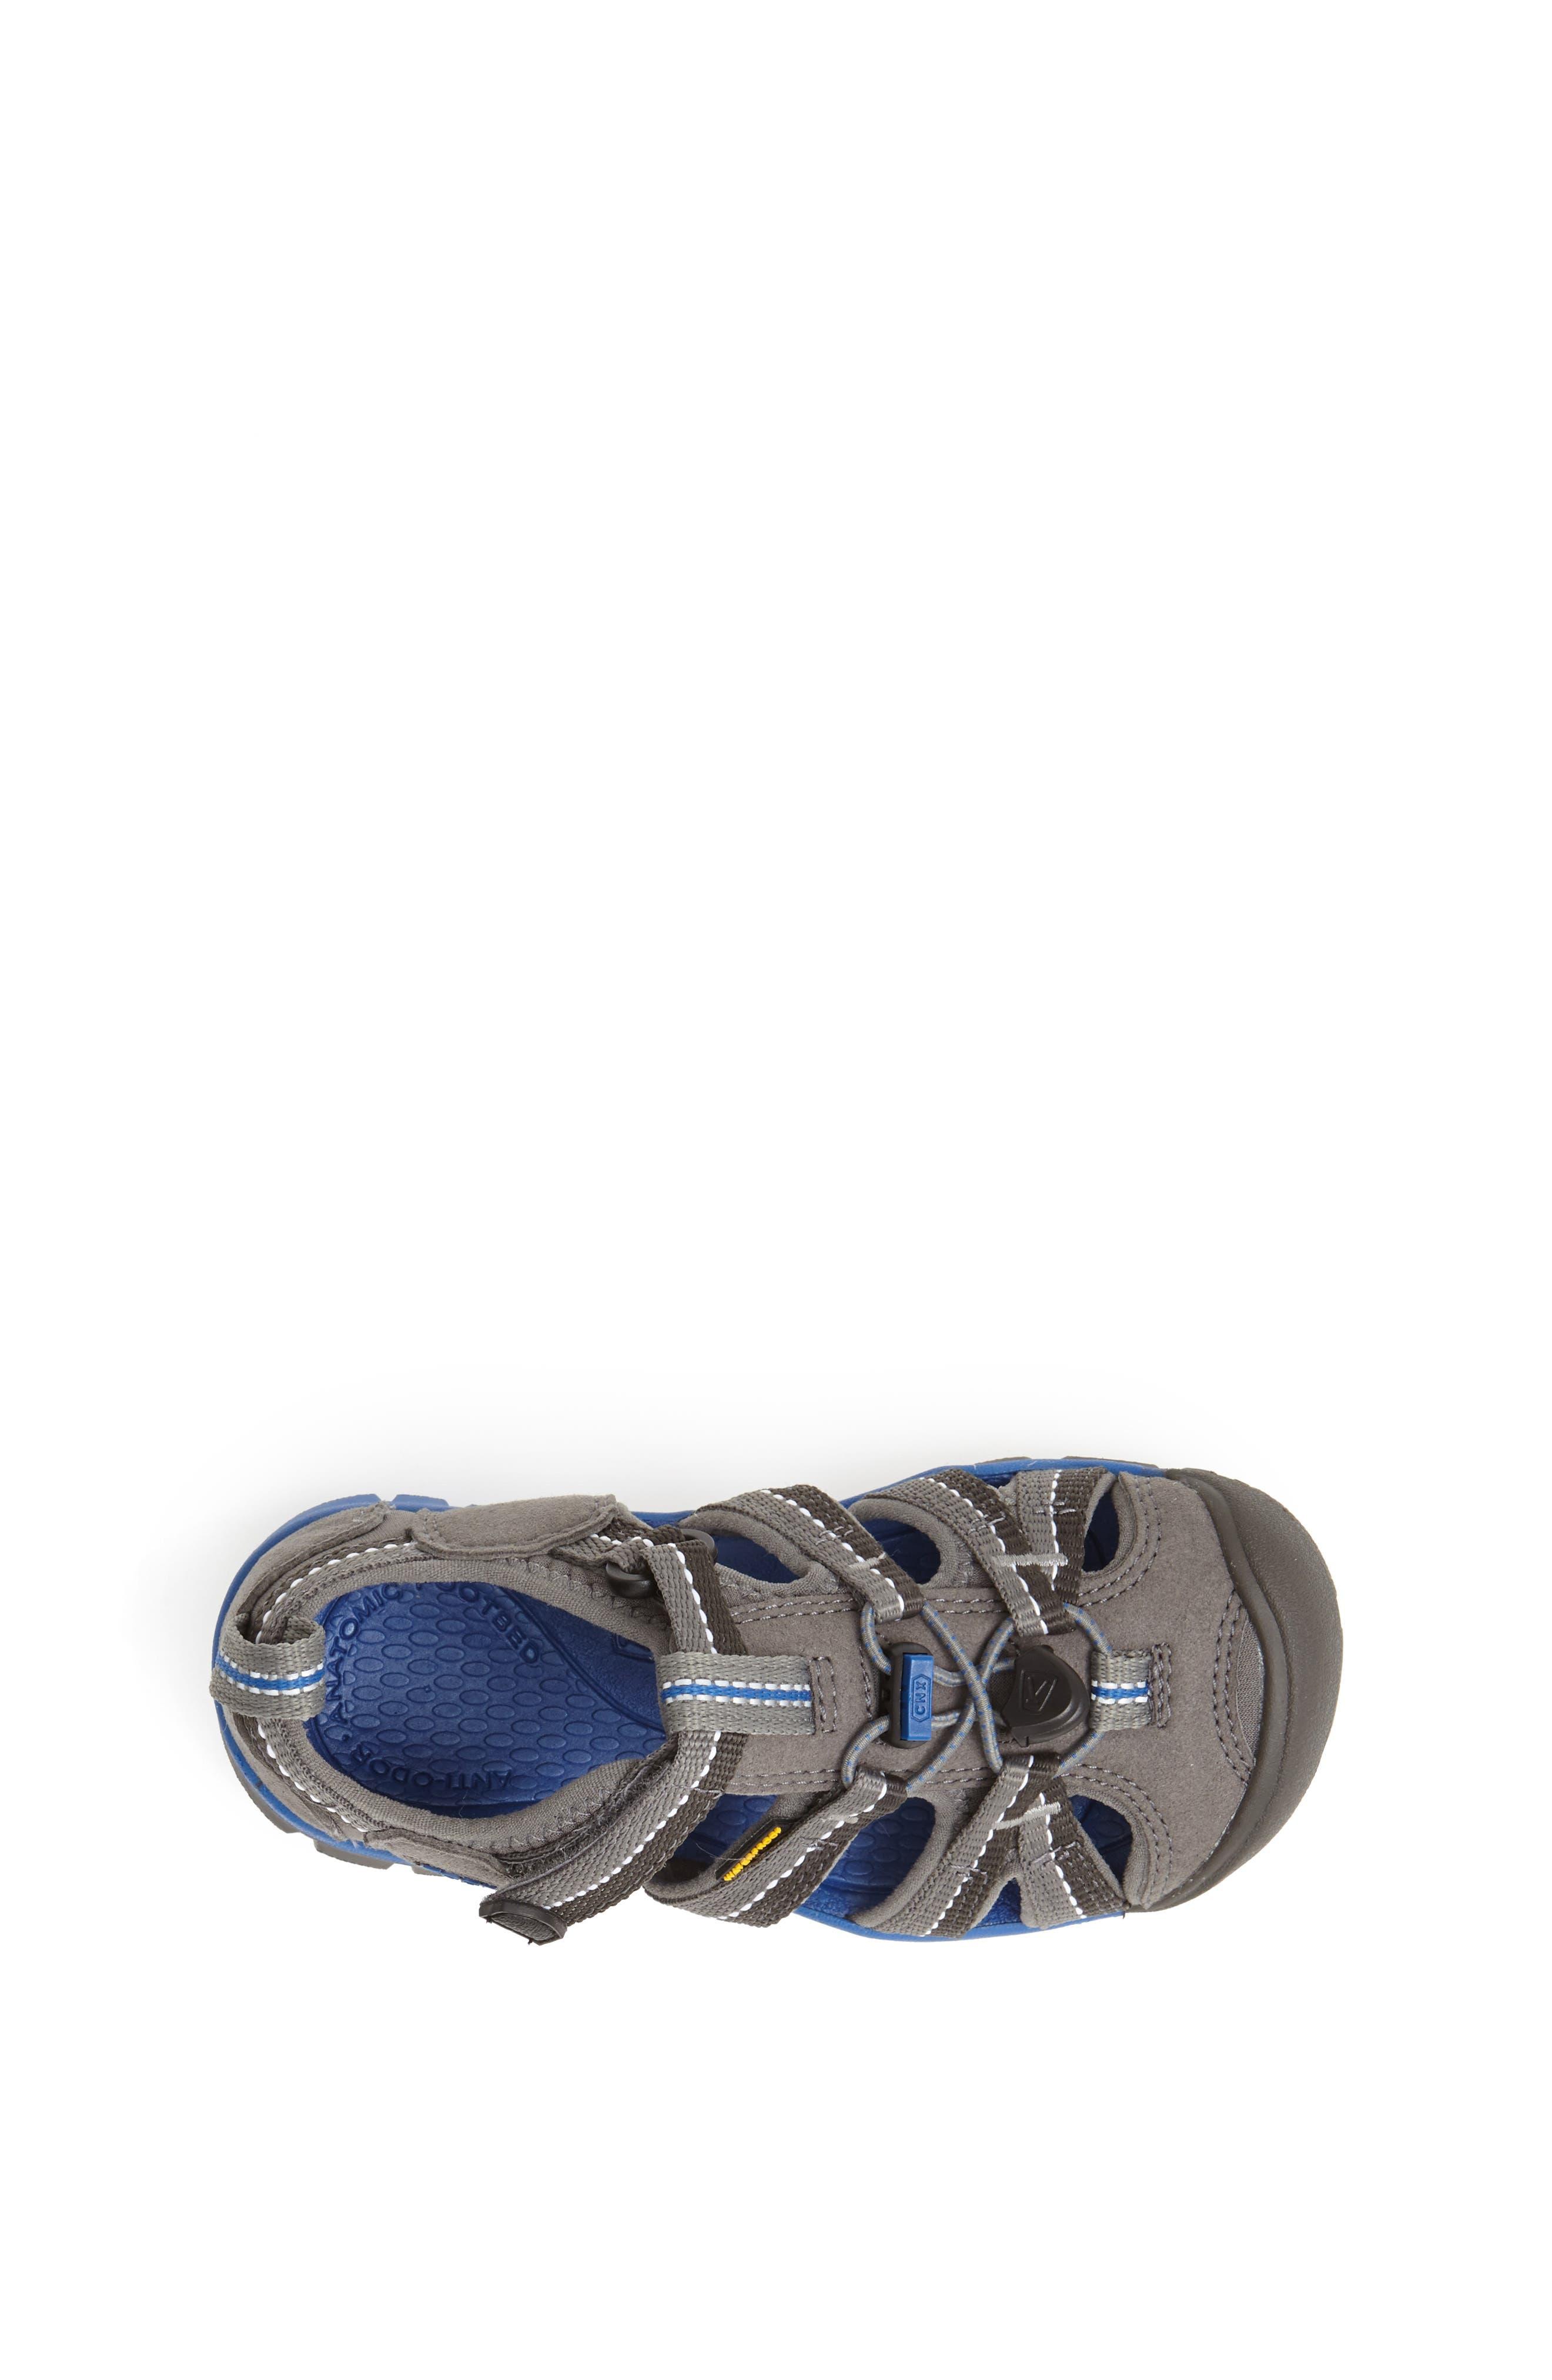 ,                             'Seacamp II' Water Friendly Sandal,                             Alternate thumbnail 112, color,                             020